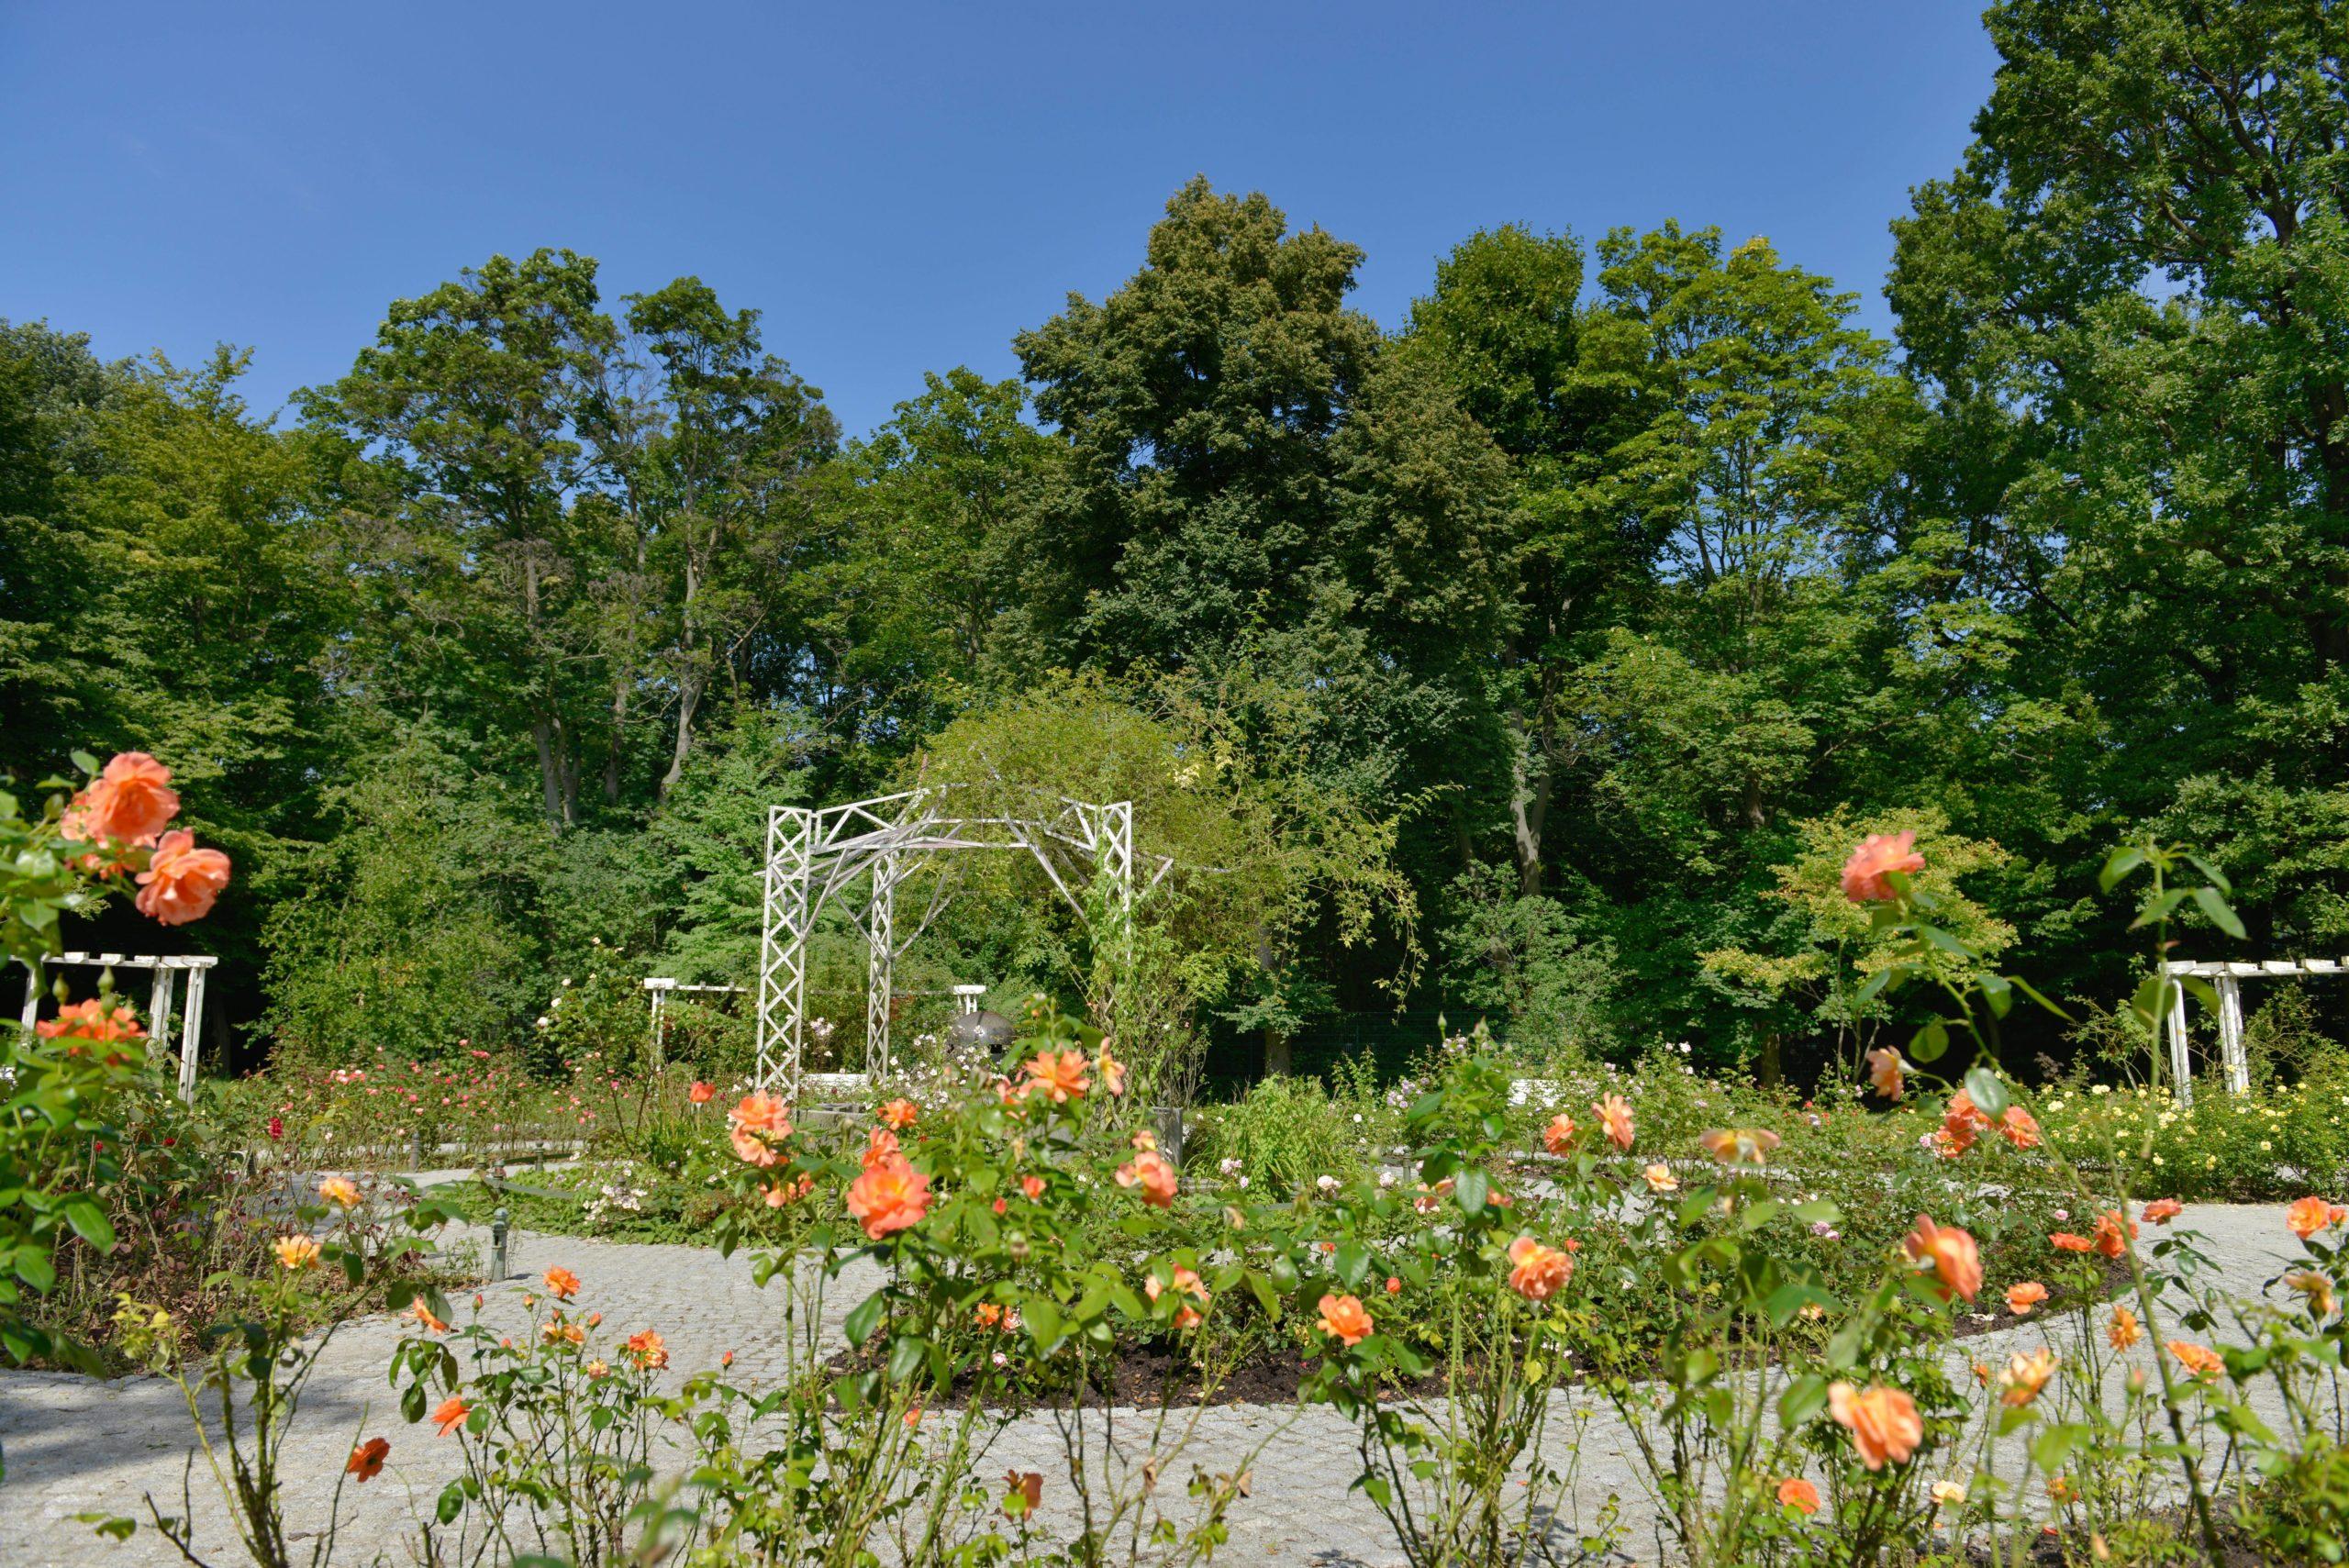 Besonderer Anblick: der Rosengarten im Volkspark Hasenheide. Foto: Imago/Schöning